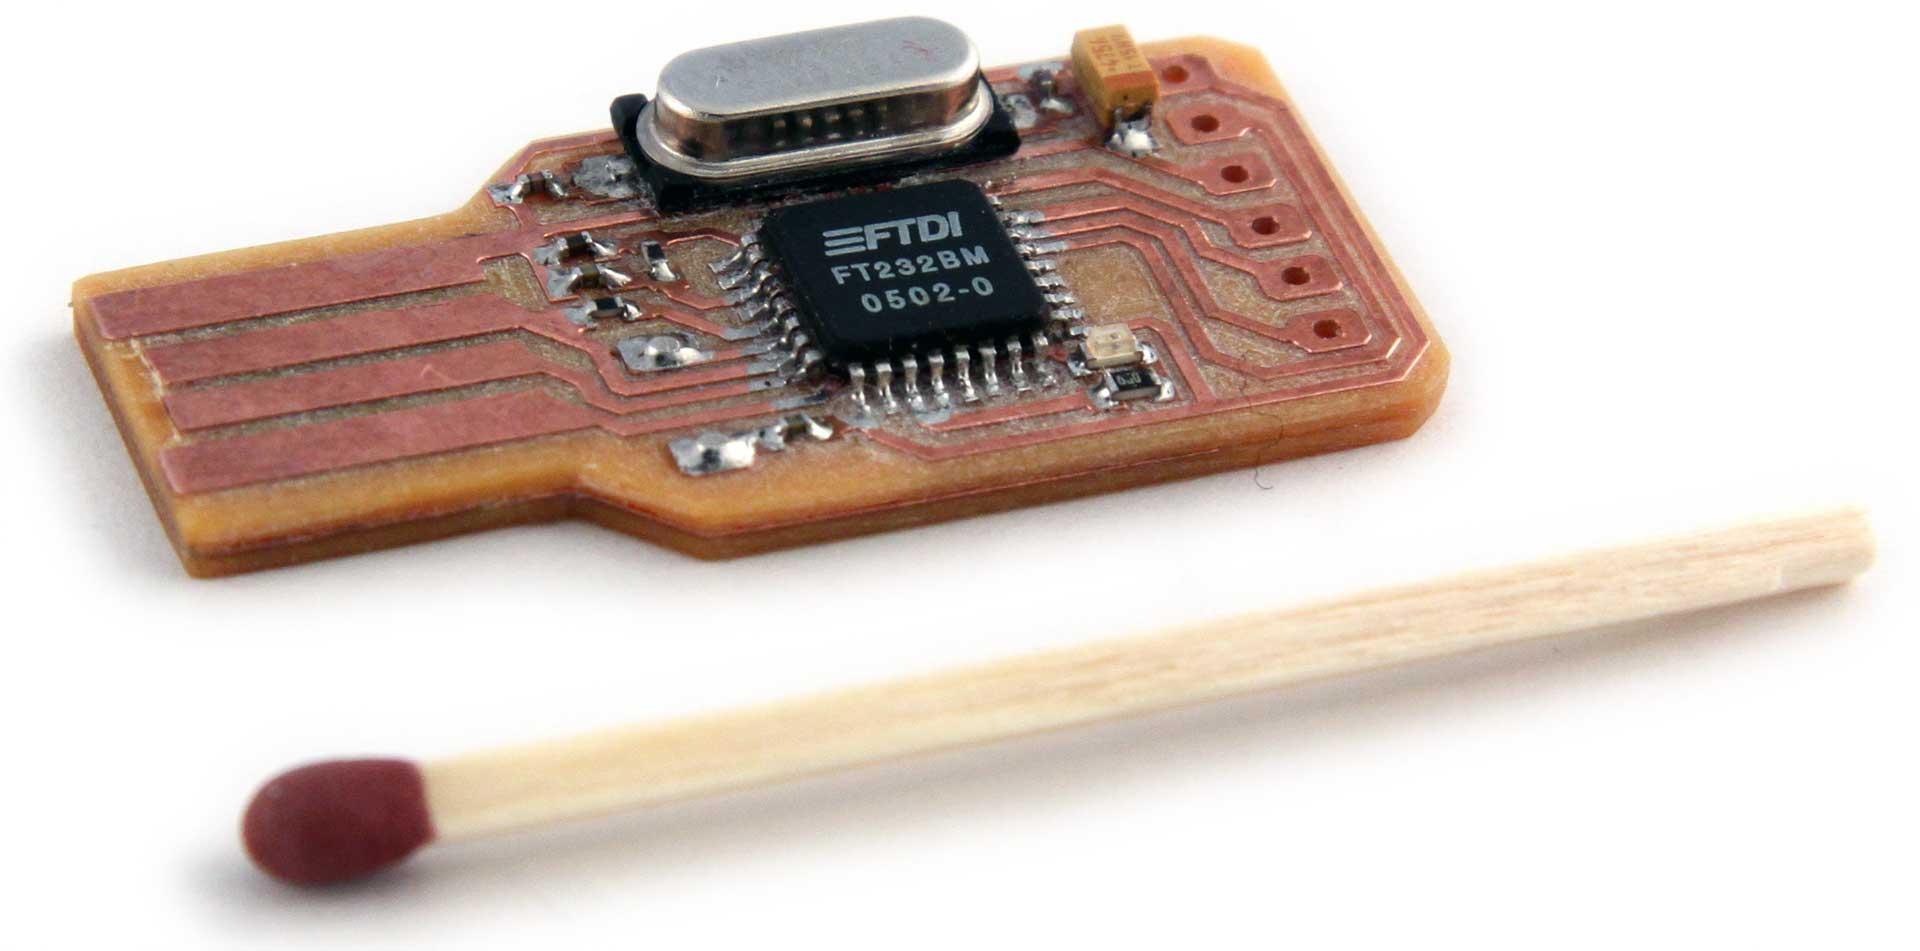 Miniature Usb To Serial Pcb Johan Von Konow Smt Dip Pcba Suitable For Camera Circuit Board And Electronic Description